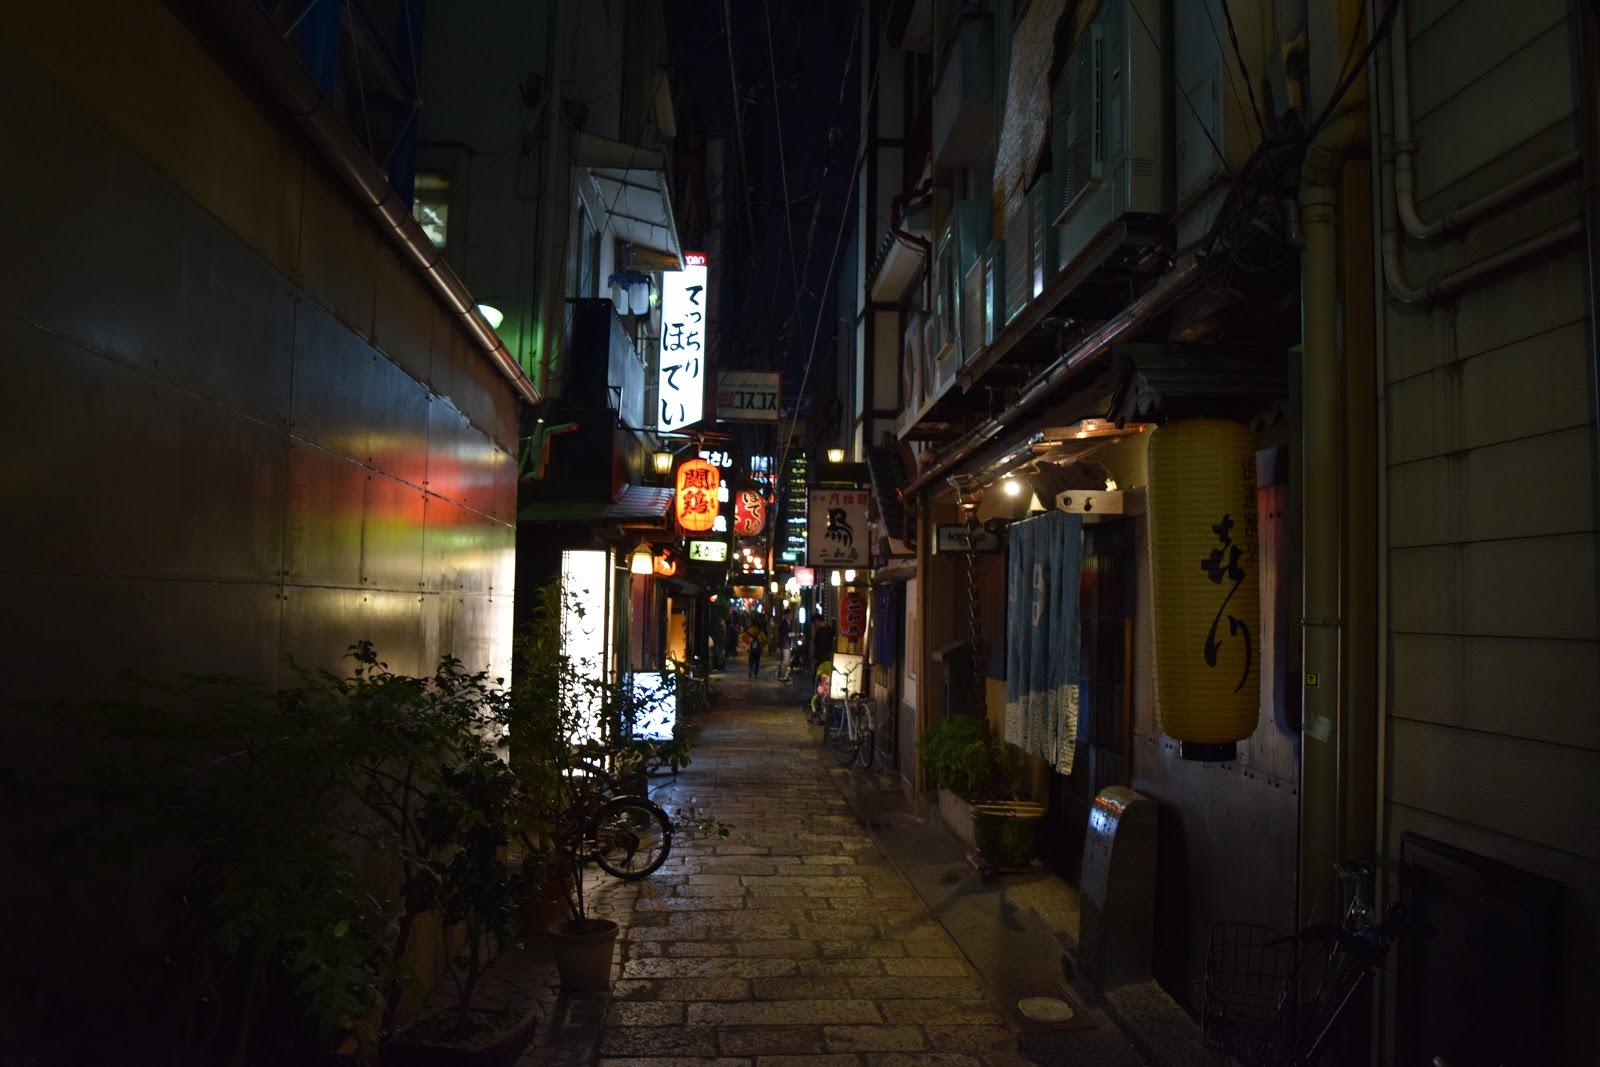 Namba, Osaka side street at night with lanterns, neon lights and bicycles